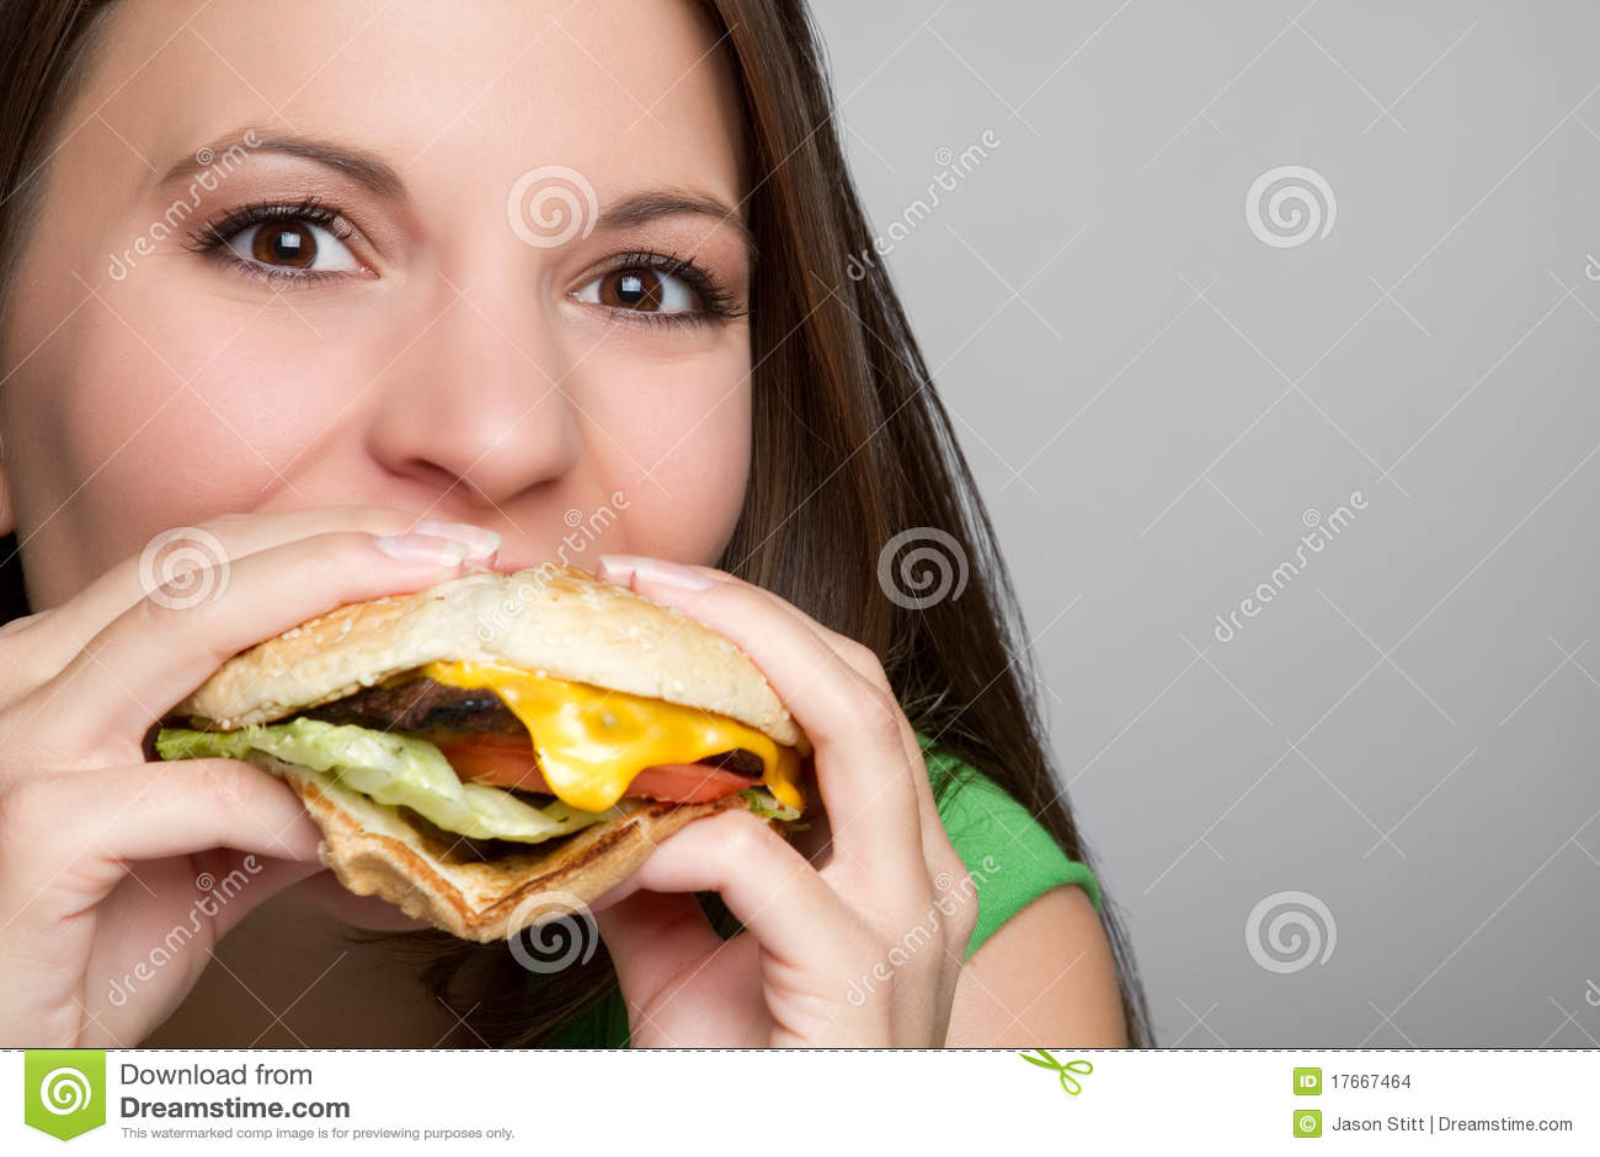 Girl Eating Hamburger Stock Photo Image Of Face Hungry